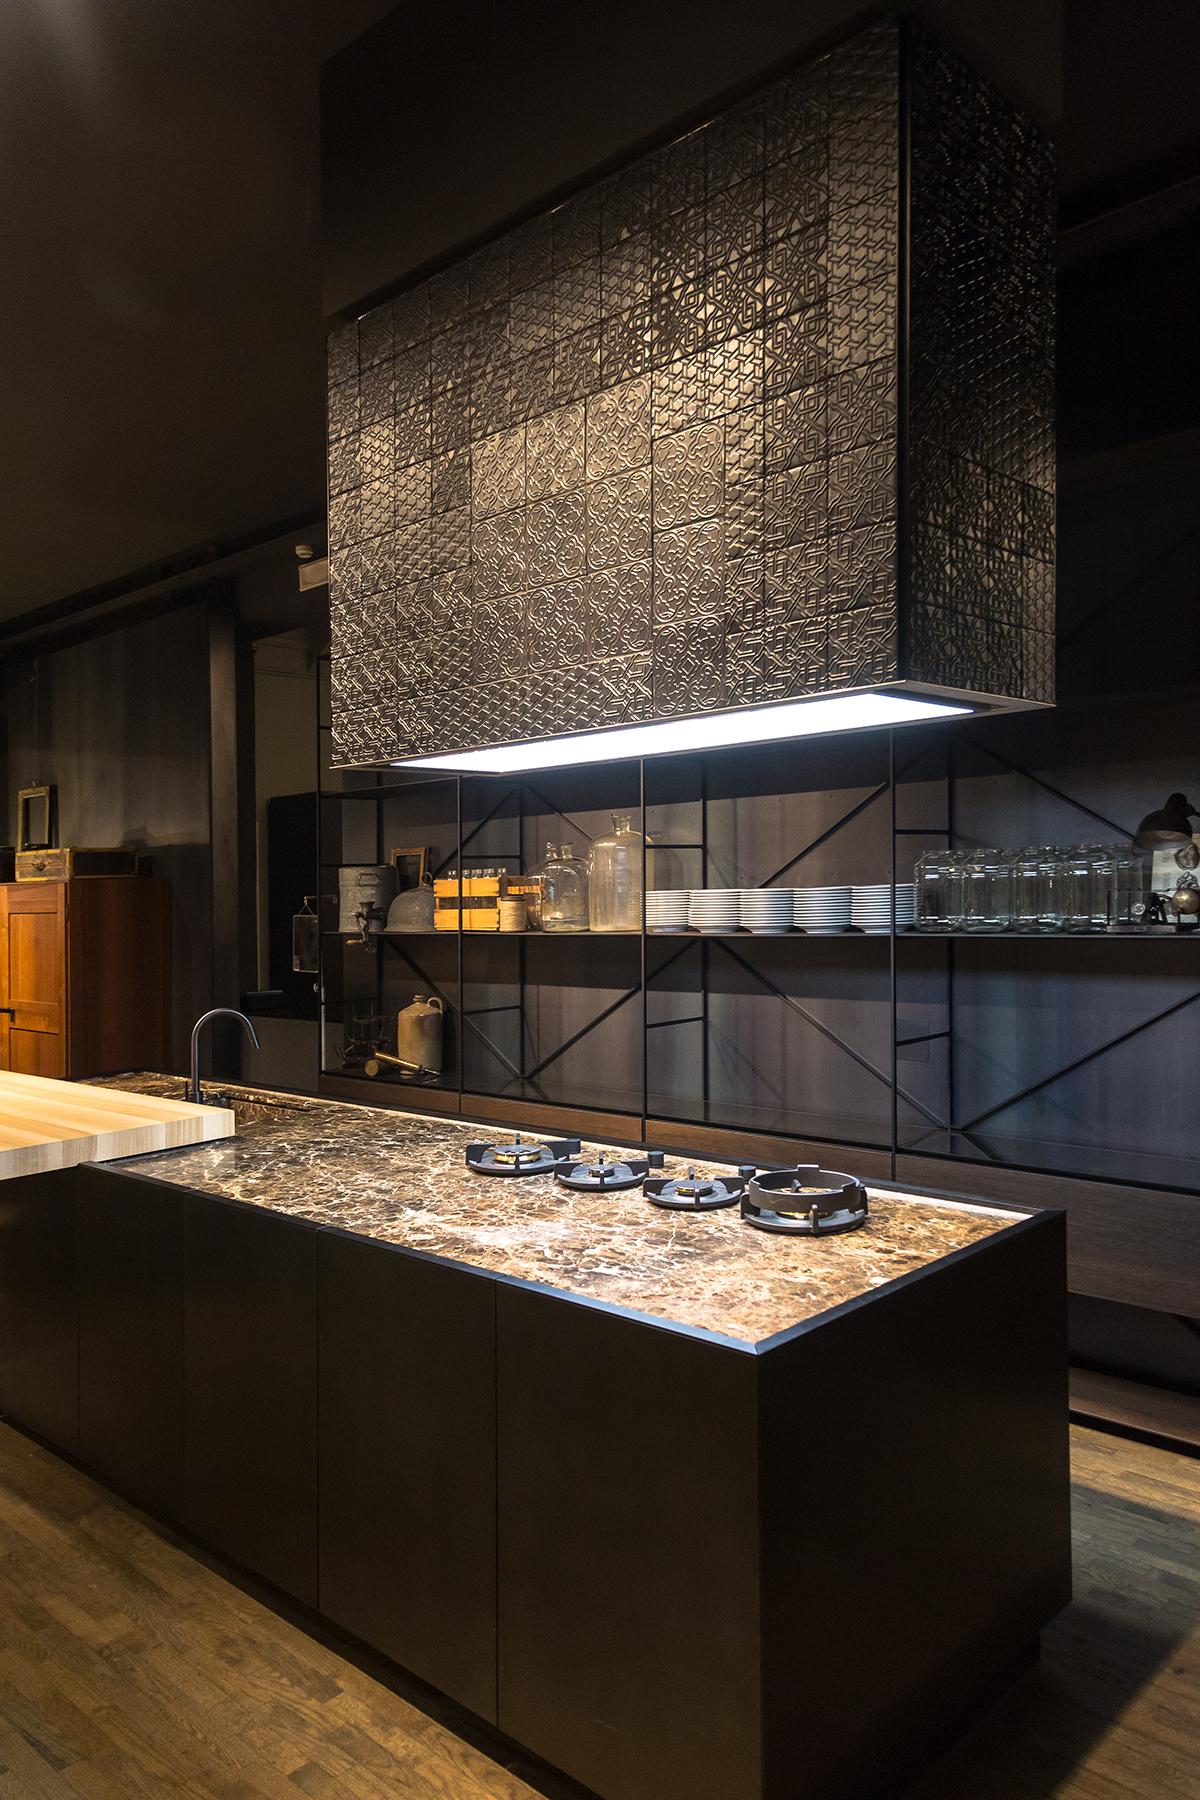 Blog Leem Wonen, Mascha Ekkel, The Art of Living, Milan Design Week,